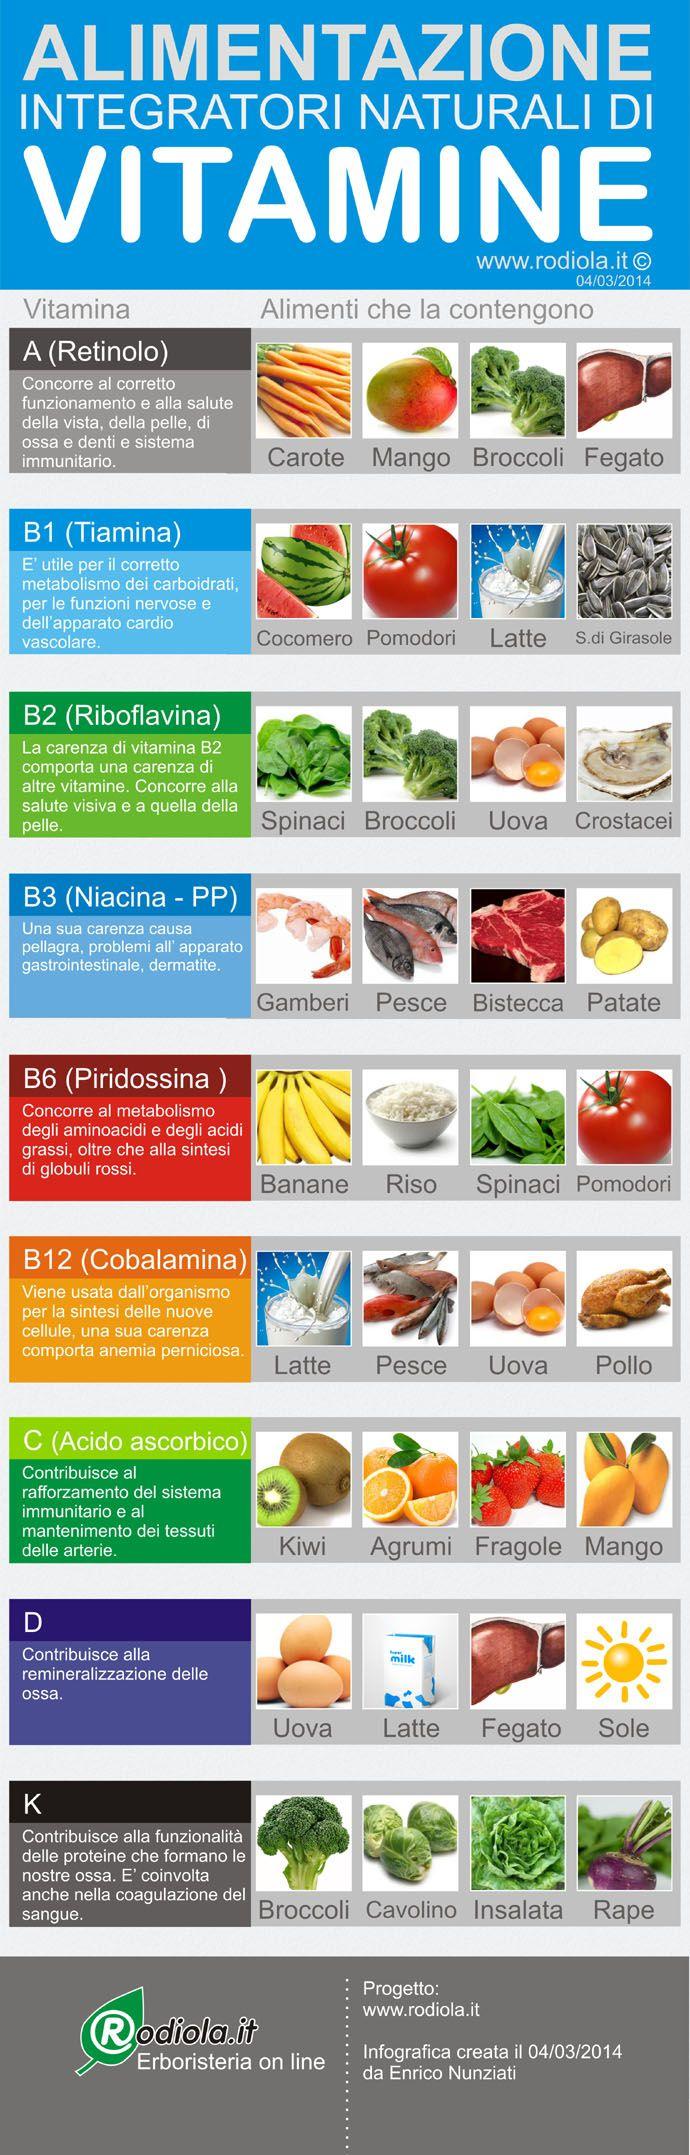 Vitamine utili e alimenti